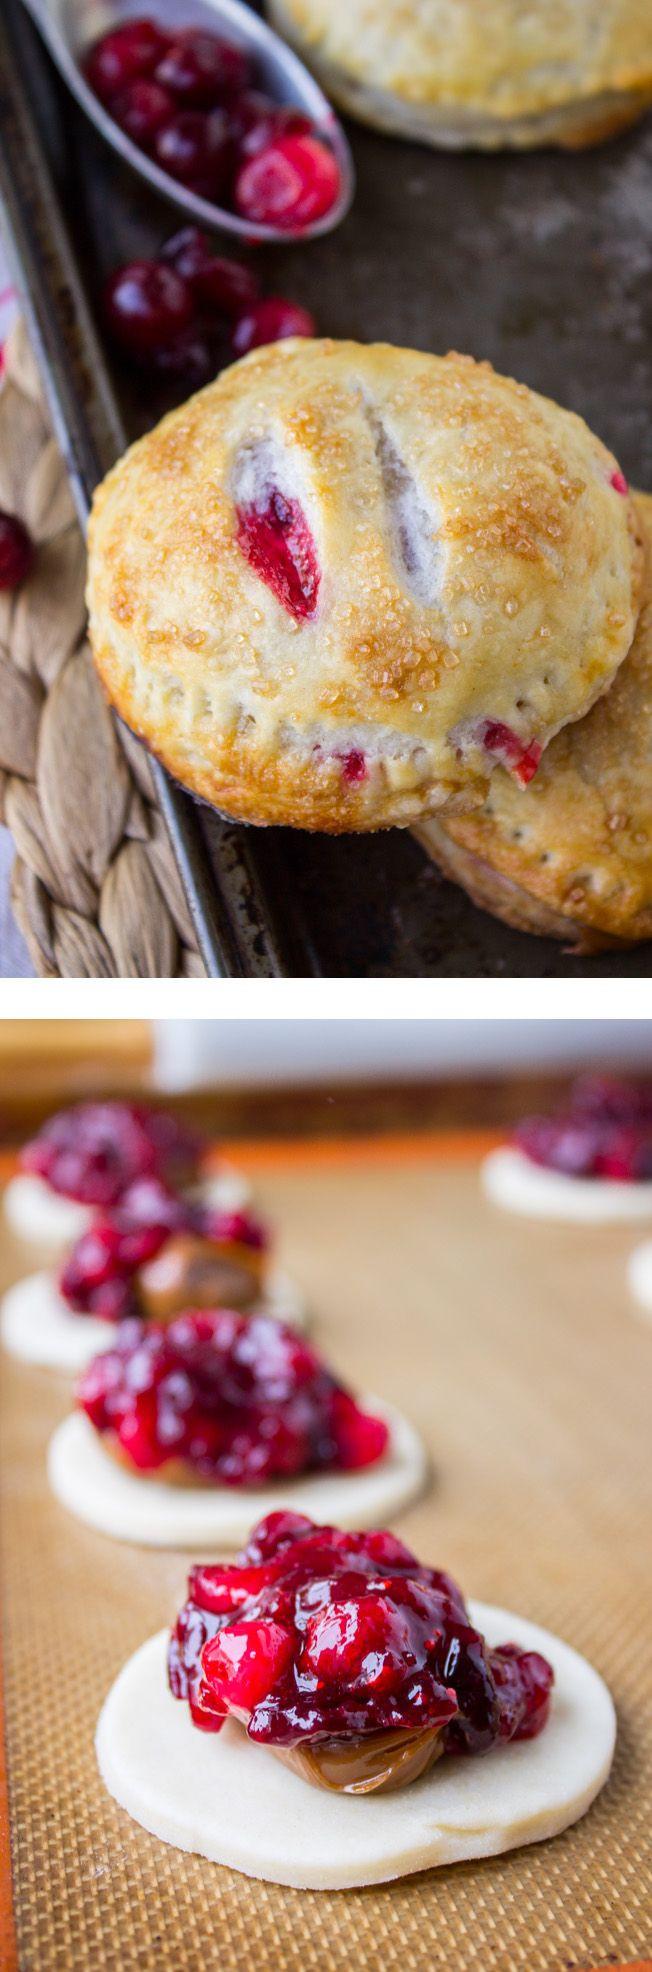 Cranberry Desserts For Thanksgiving  Best 25 Cranberry pie ideas on Pinterest